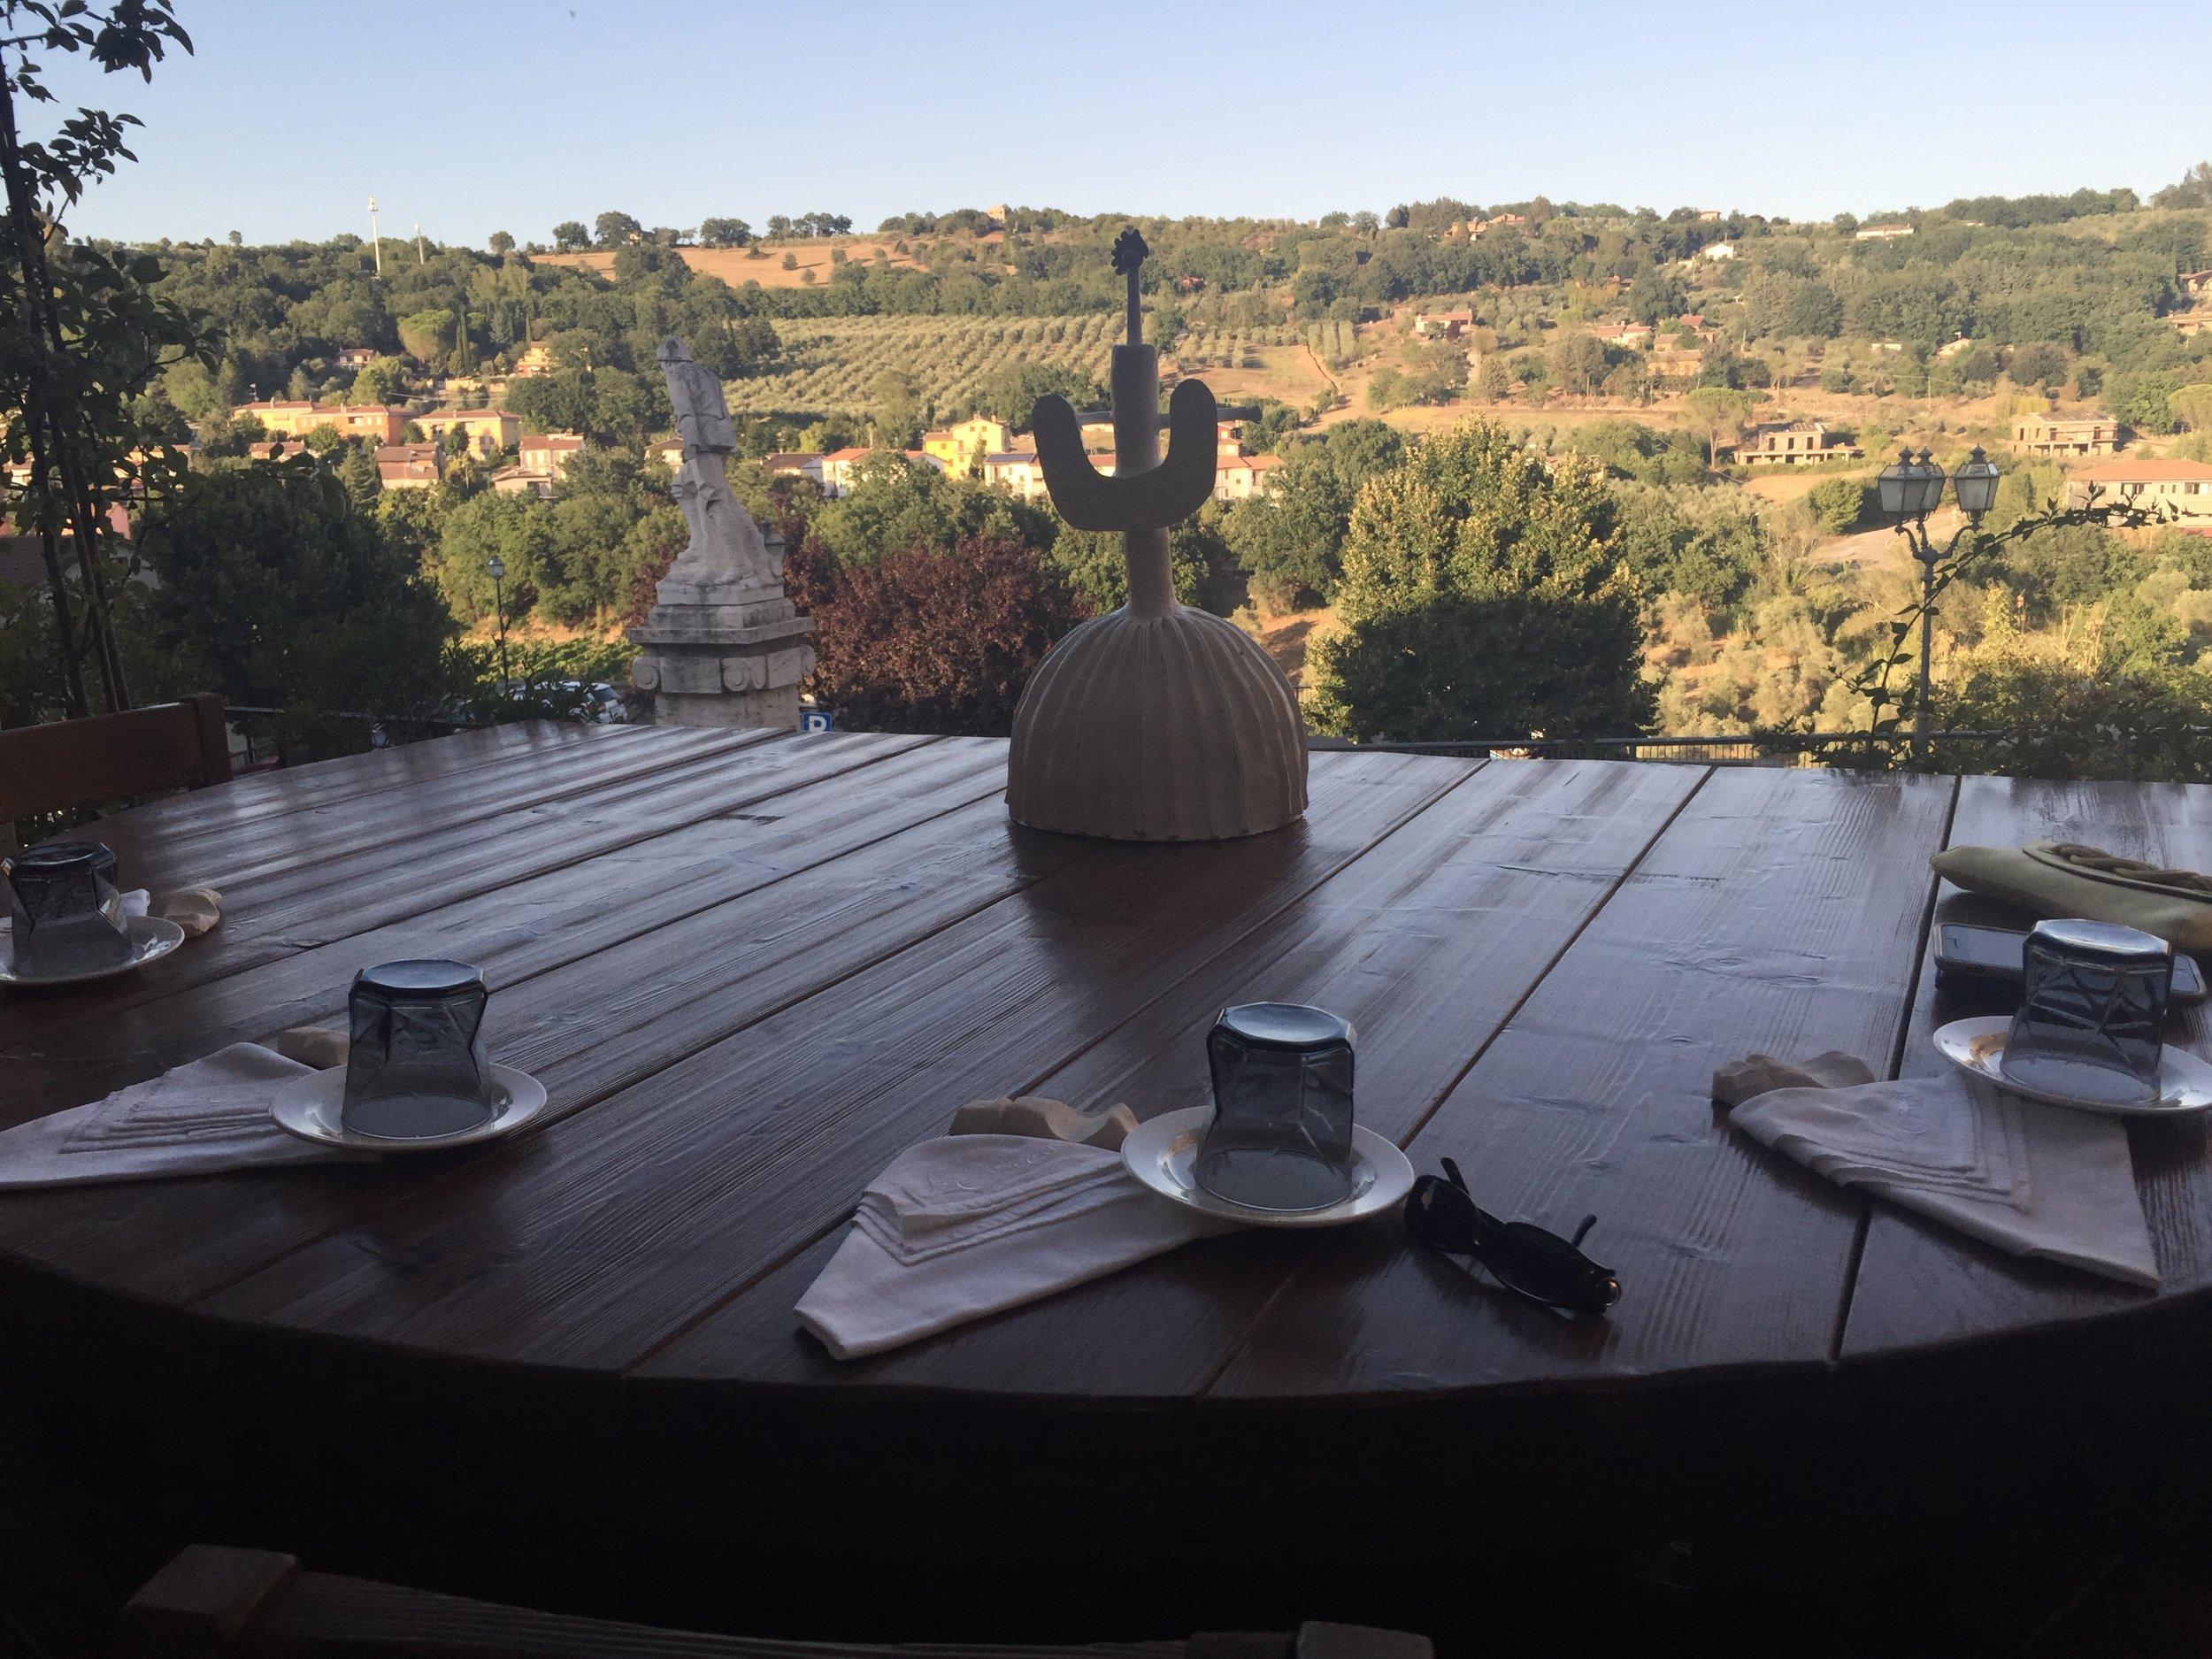 Al fresco dining at Sala Della Comitissa, Baschi, Umbria (Photo credit: Sumi_Sumilier)